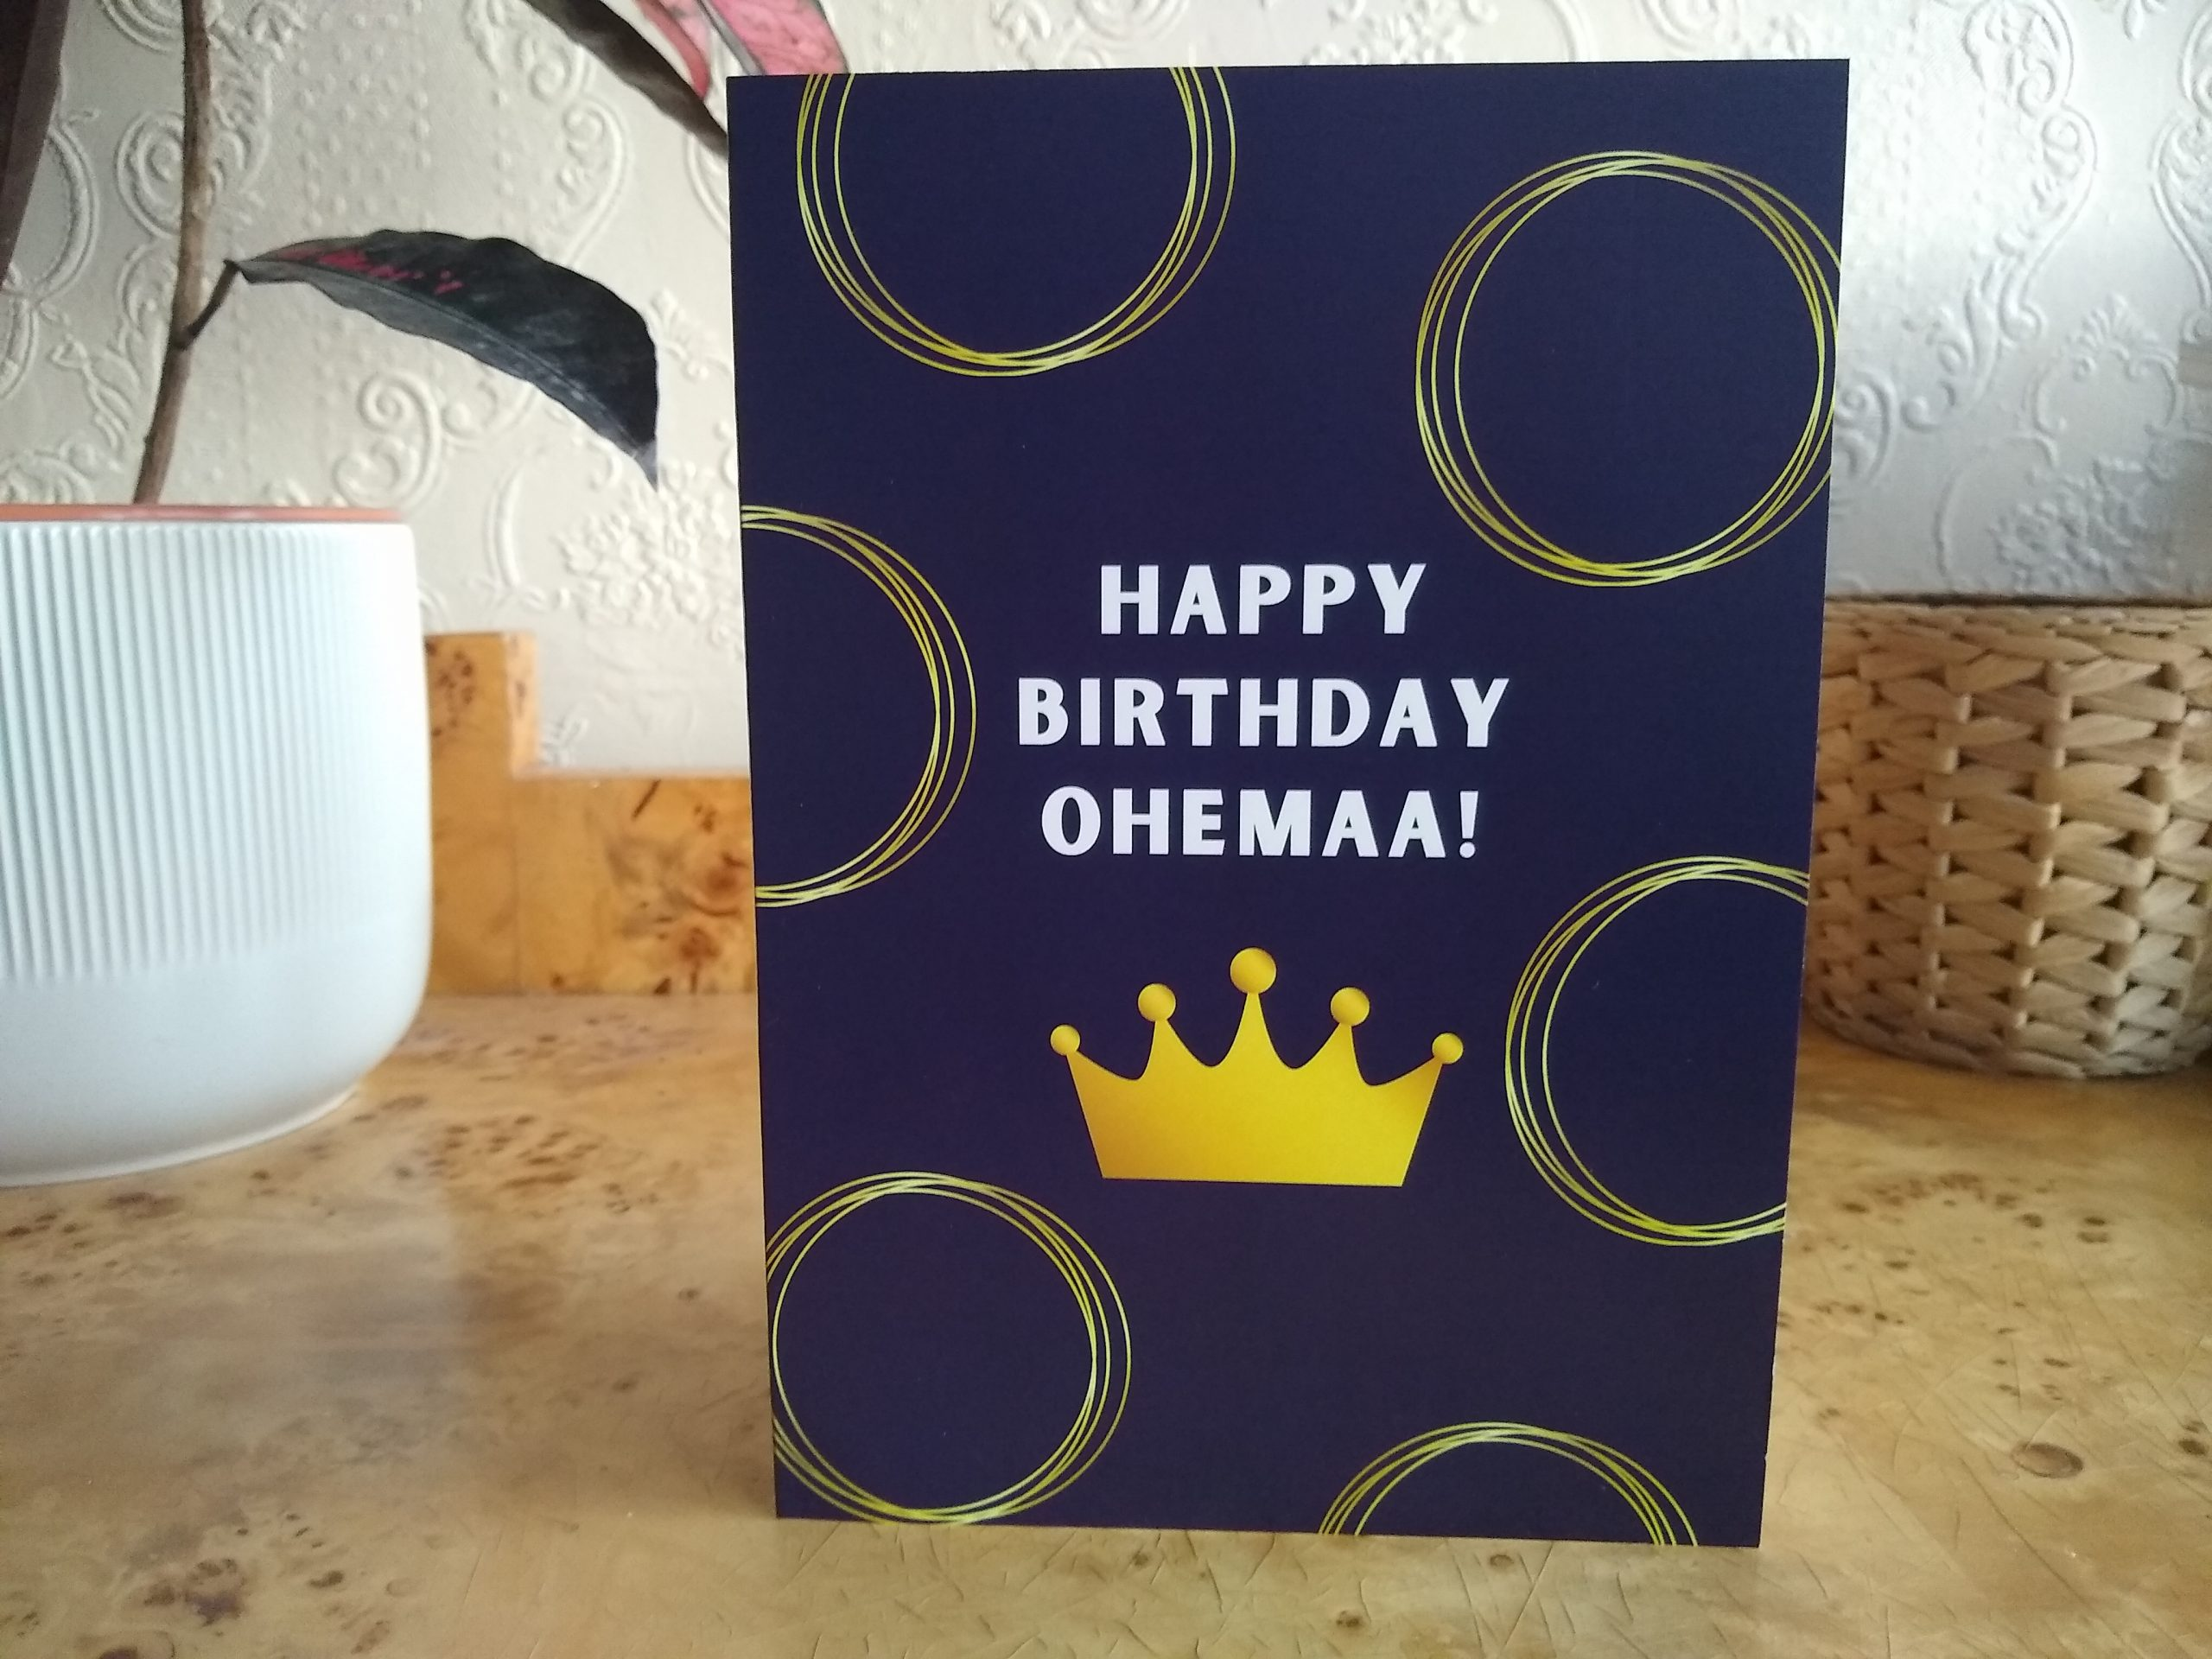 Happy Birthday Ohemaa